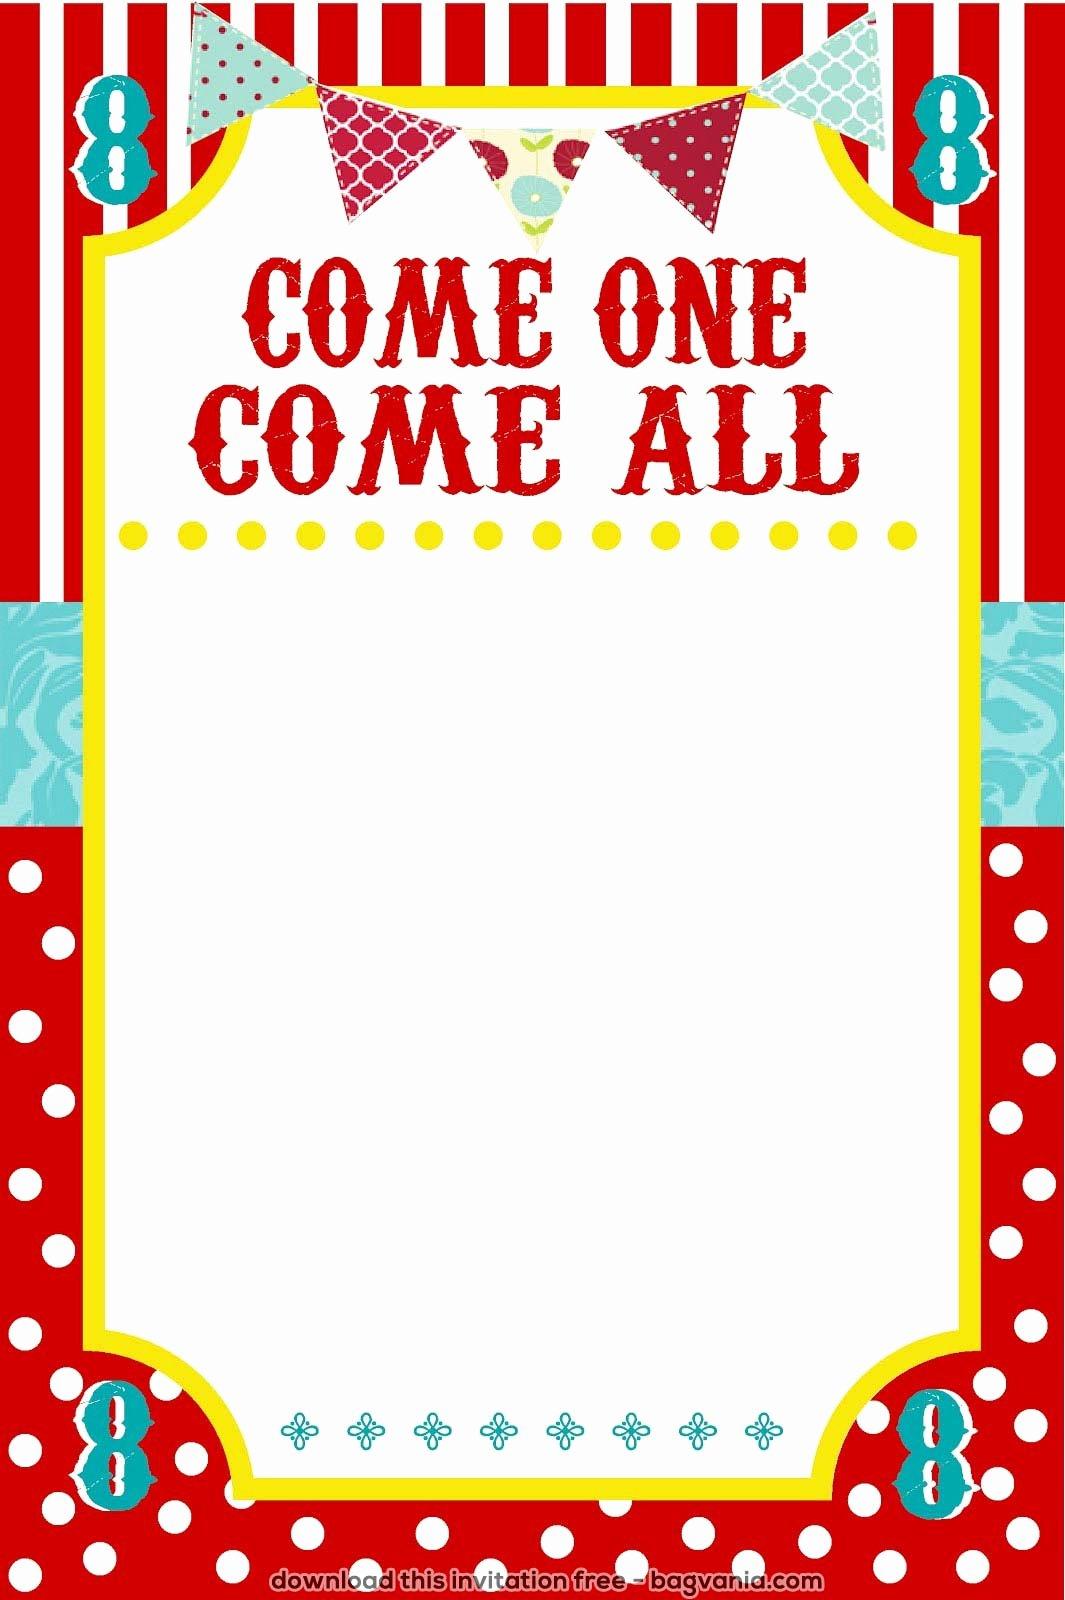 Carnival Invitation Templates Free Lovely Free Carnival Birthday Invitations – Free Printable